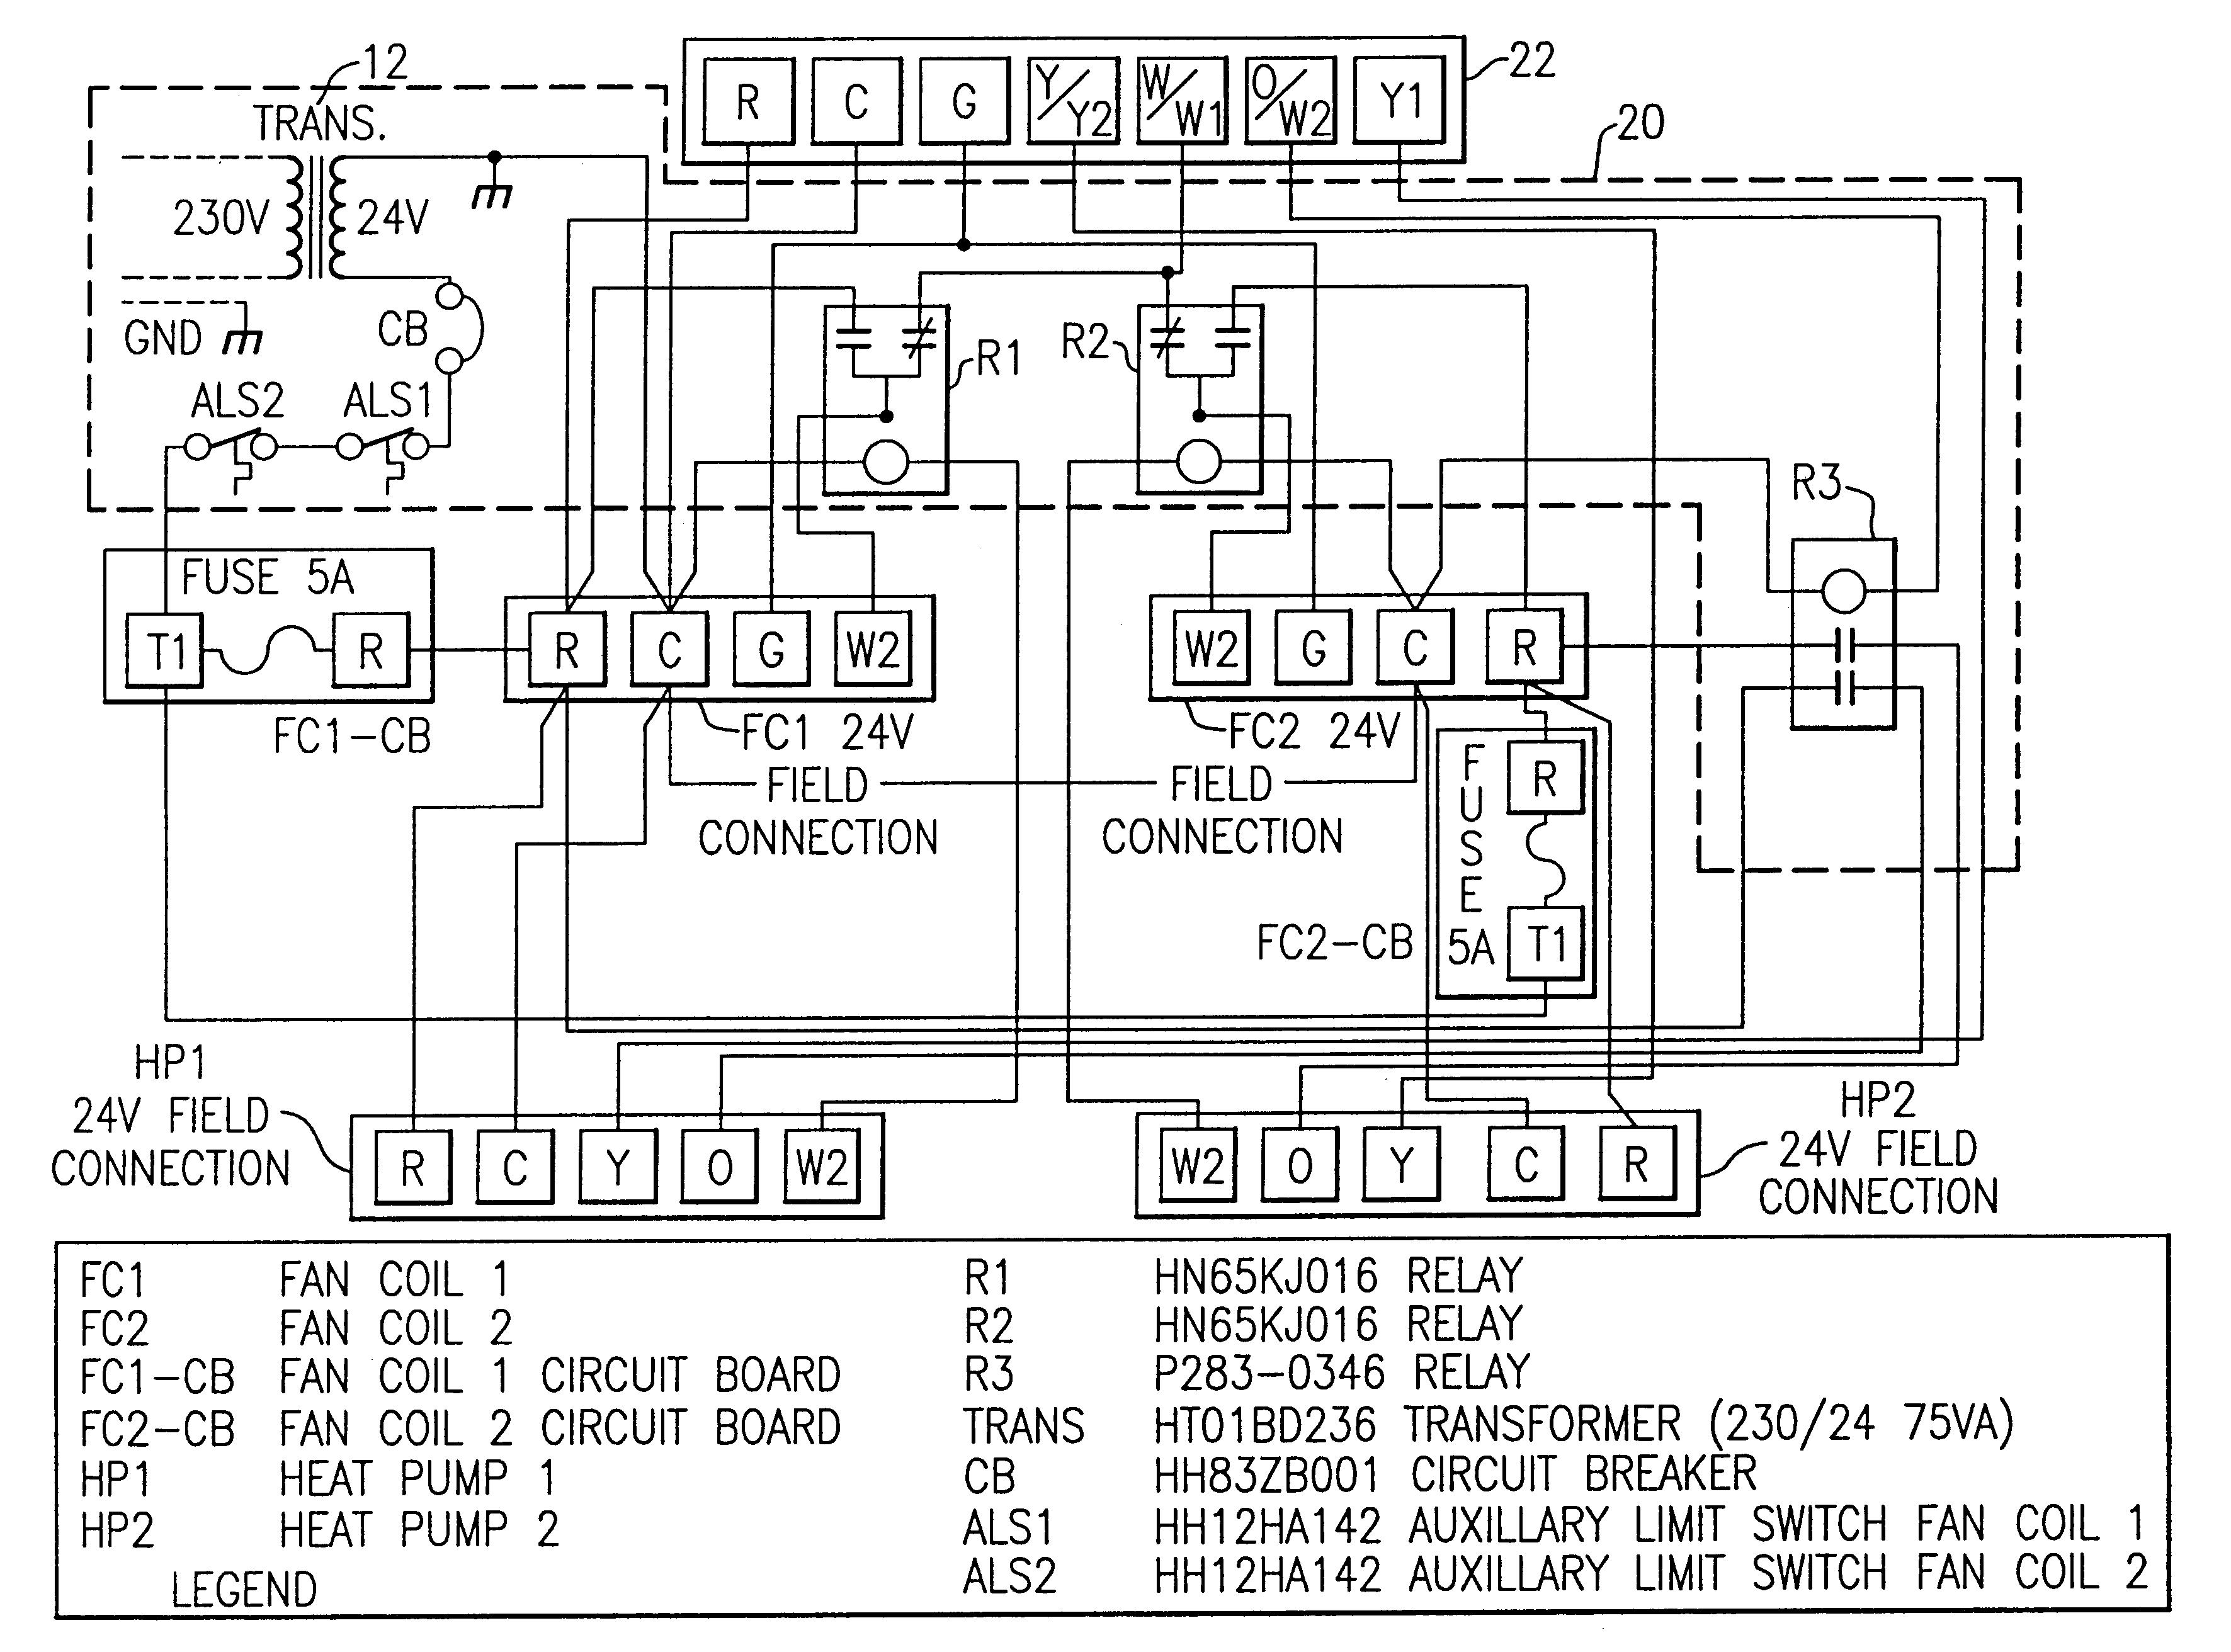 carrier heat pump low voltage wiring diagram Download-Carrier Heat Pump Wiring Diagram York Help Doityourself In Best Goodman Heat Pump Low Voltage 9-b